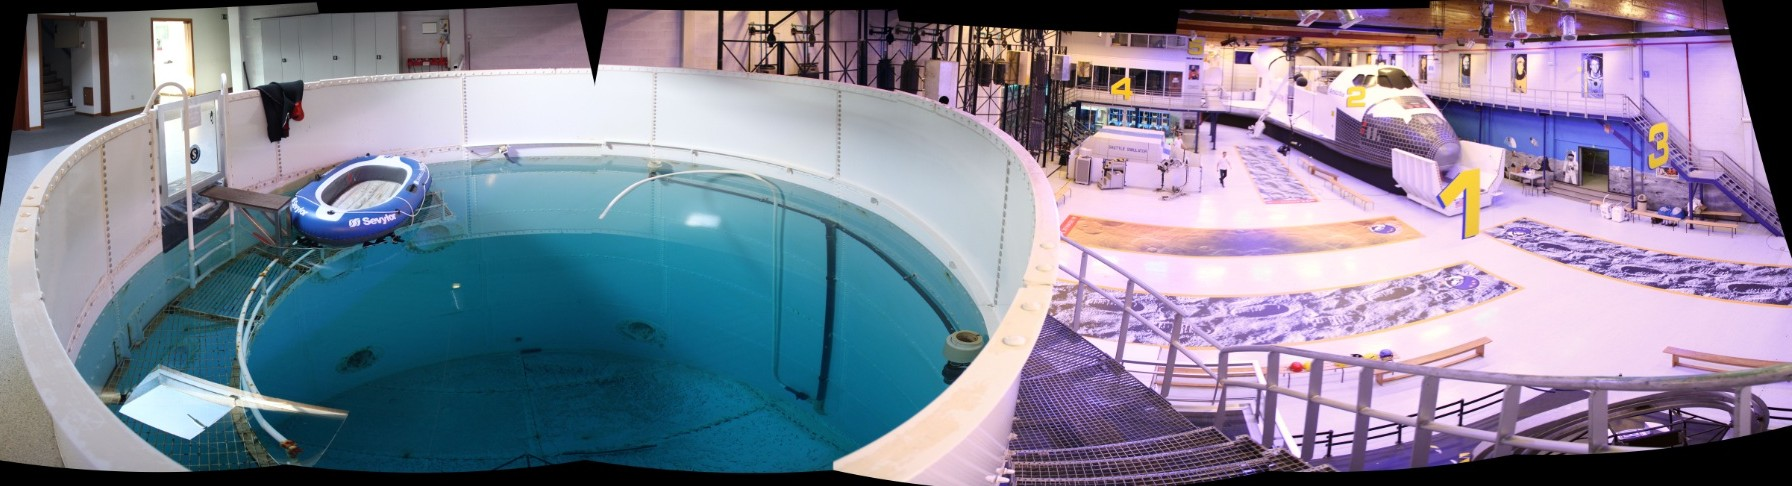 15 02 28 - 09h 15m 16s - Eurospace center hall_stitch r